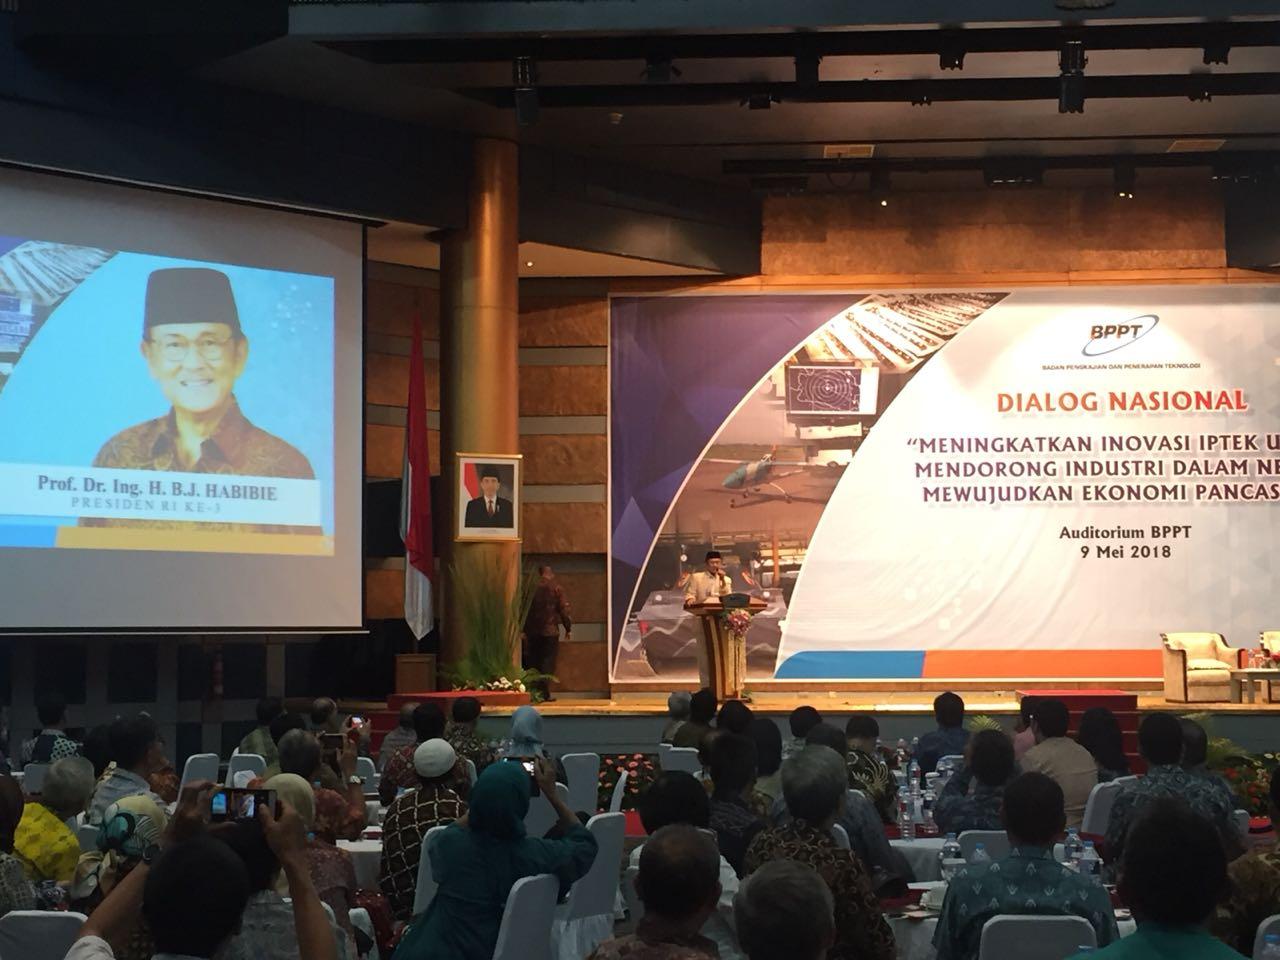 https: img-k.okeinfo.net content 2018 05 09 320 1896198 bj-habibie-soroti-peran-teknologi-demi-nilai-tambah-produk-industri-indonesia-s4BYuRMnNN.jpeg